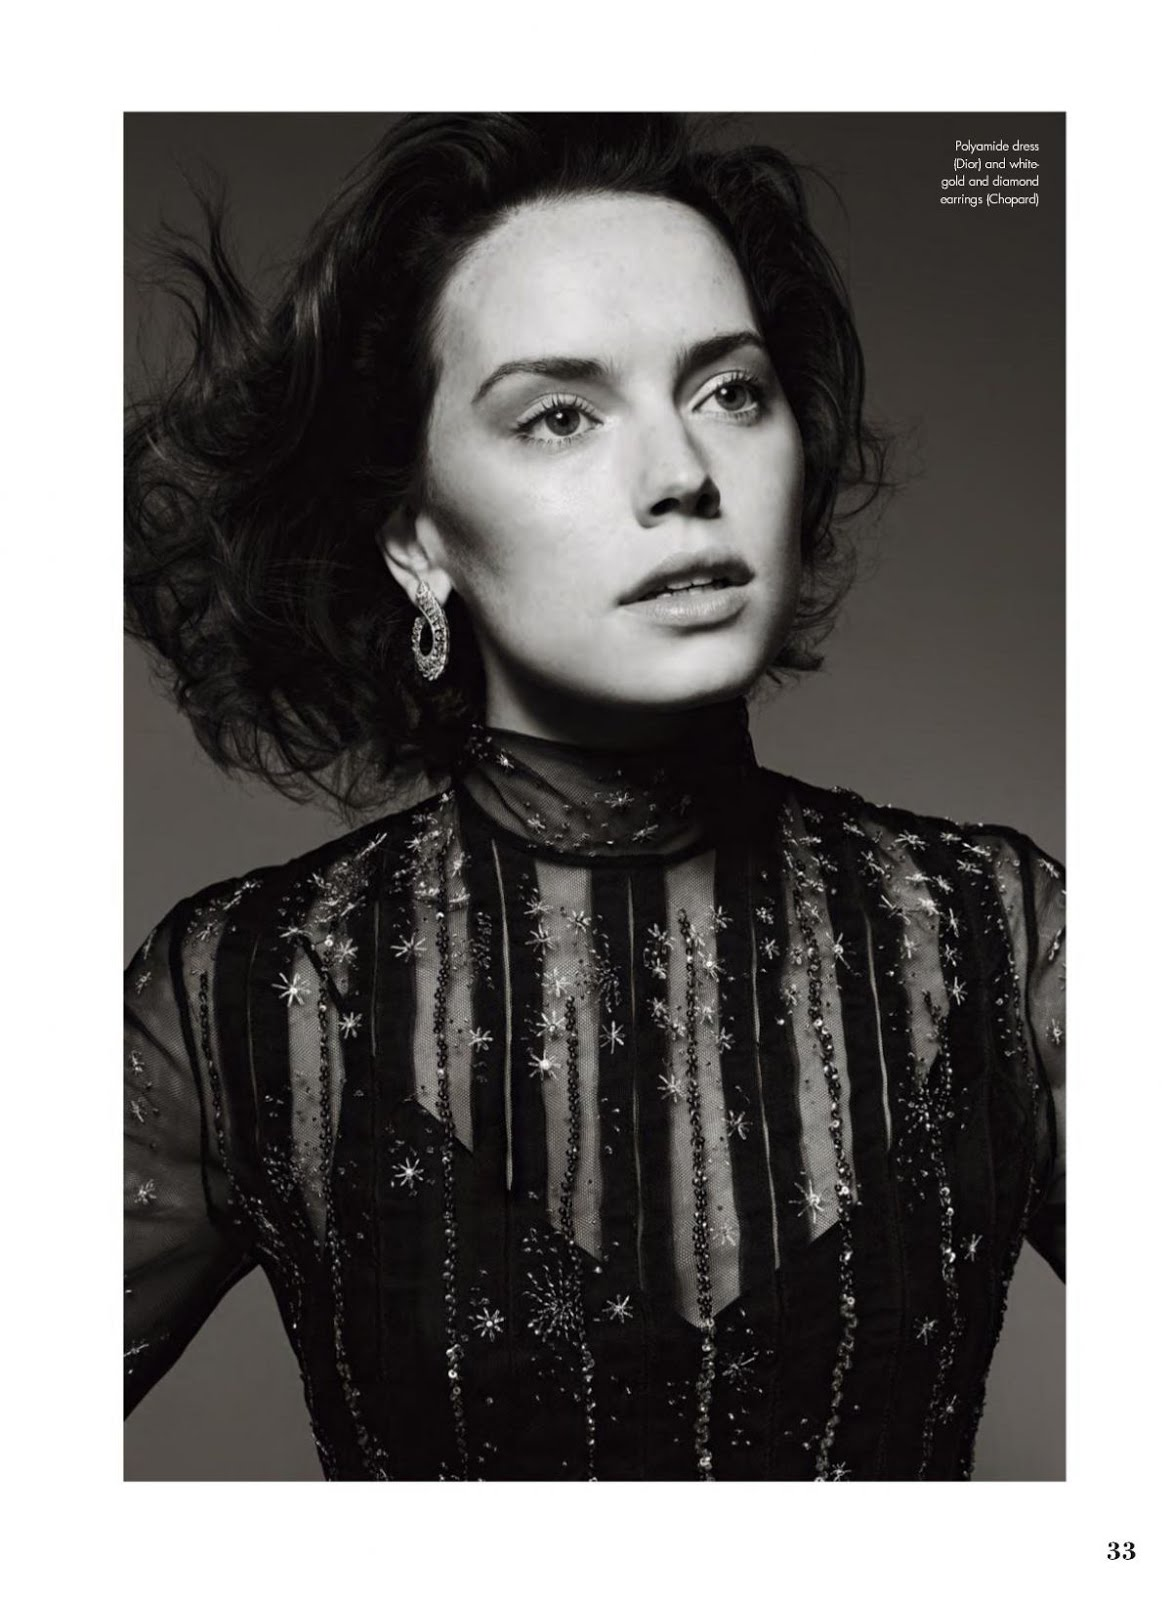 Daisy Ridley In Elle Magazine Canada February 2018 issue